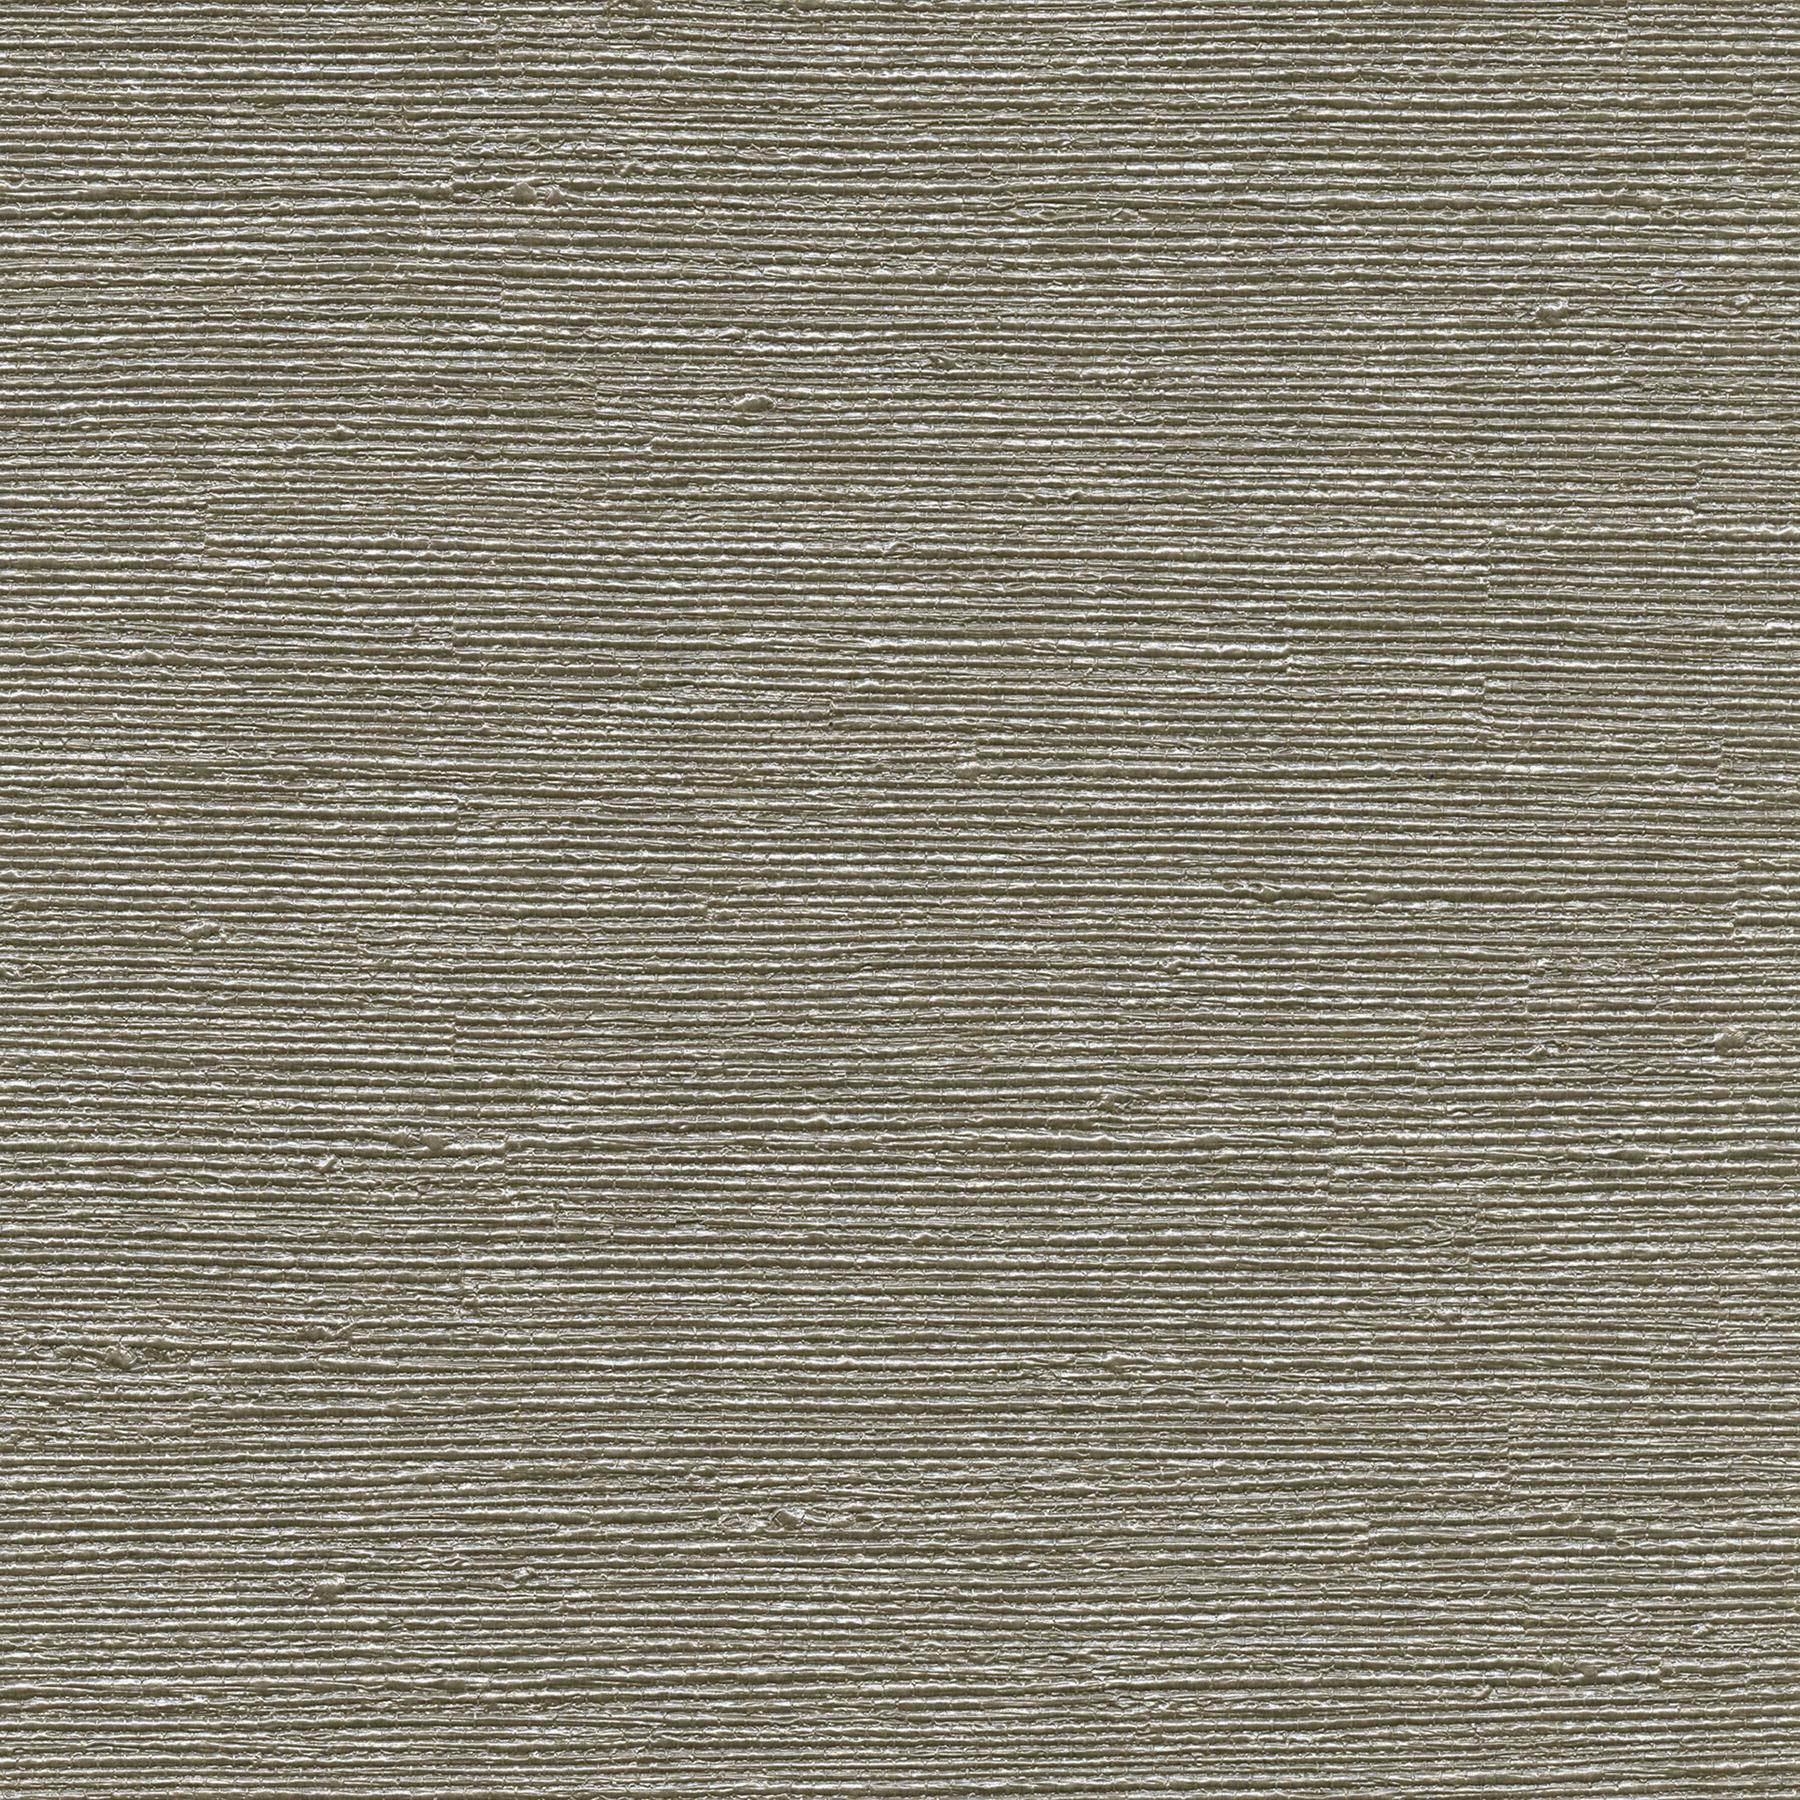 Picture of Aspero Taupe Faux Grasscloth Wallpaper